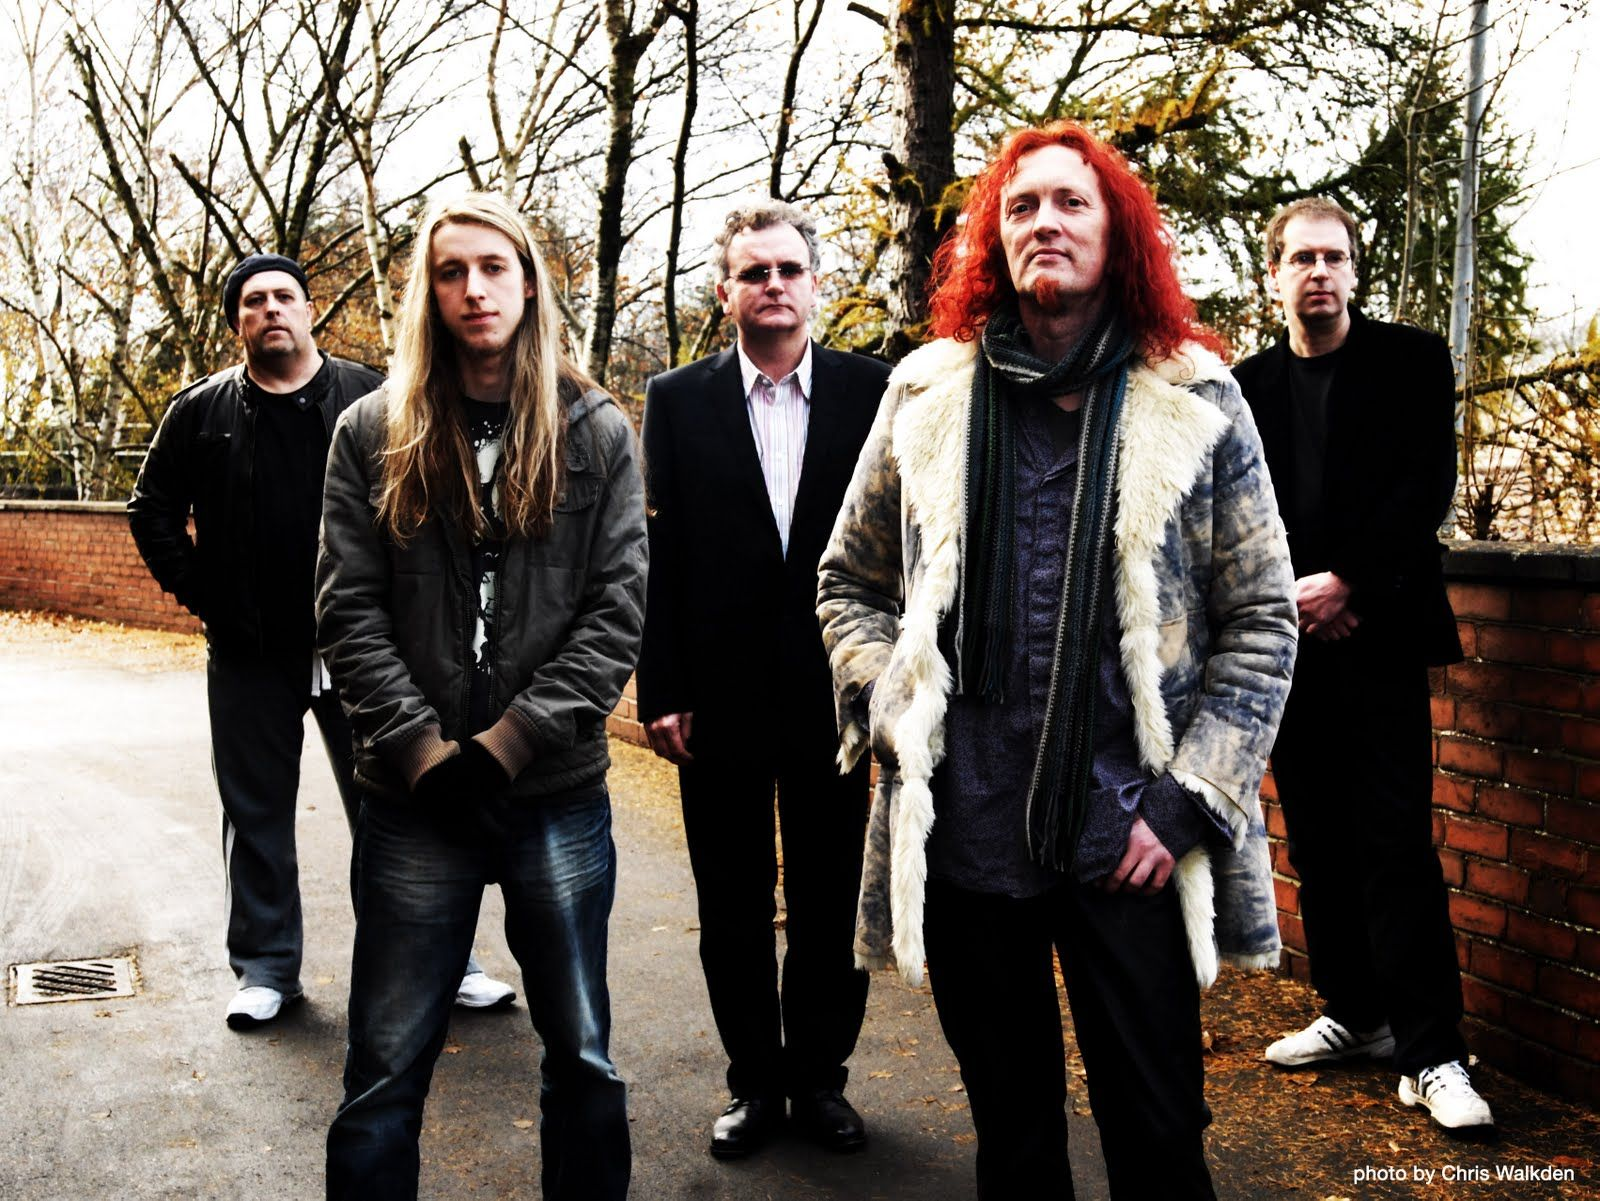 The Tangent | Winter jackets, Good music, Progressive rock